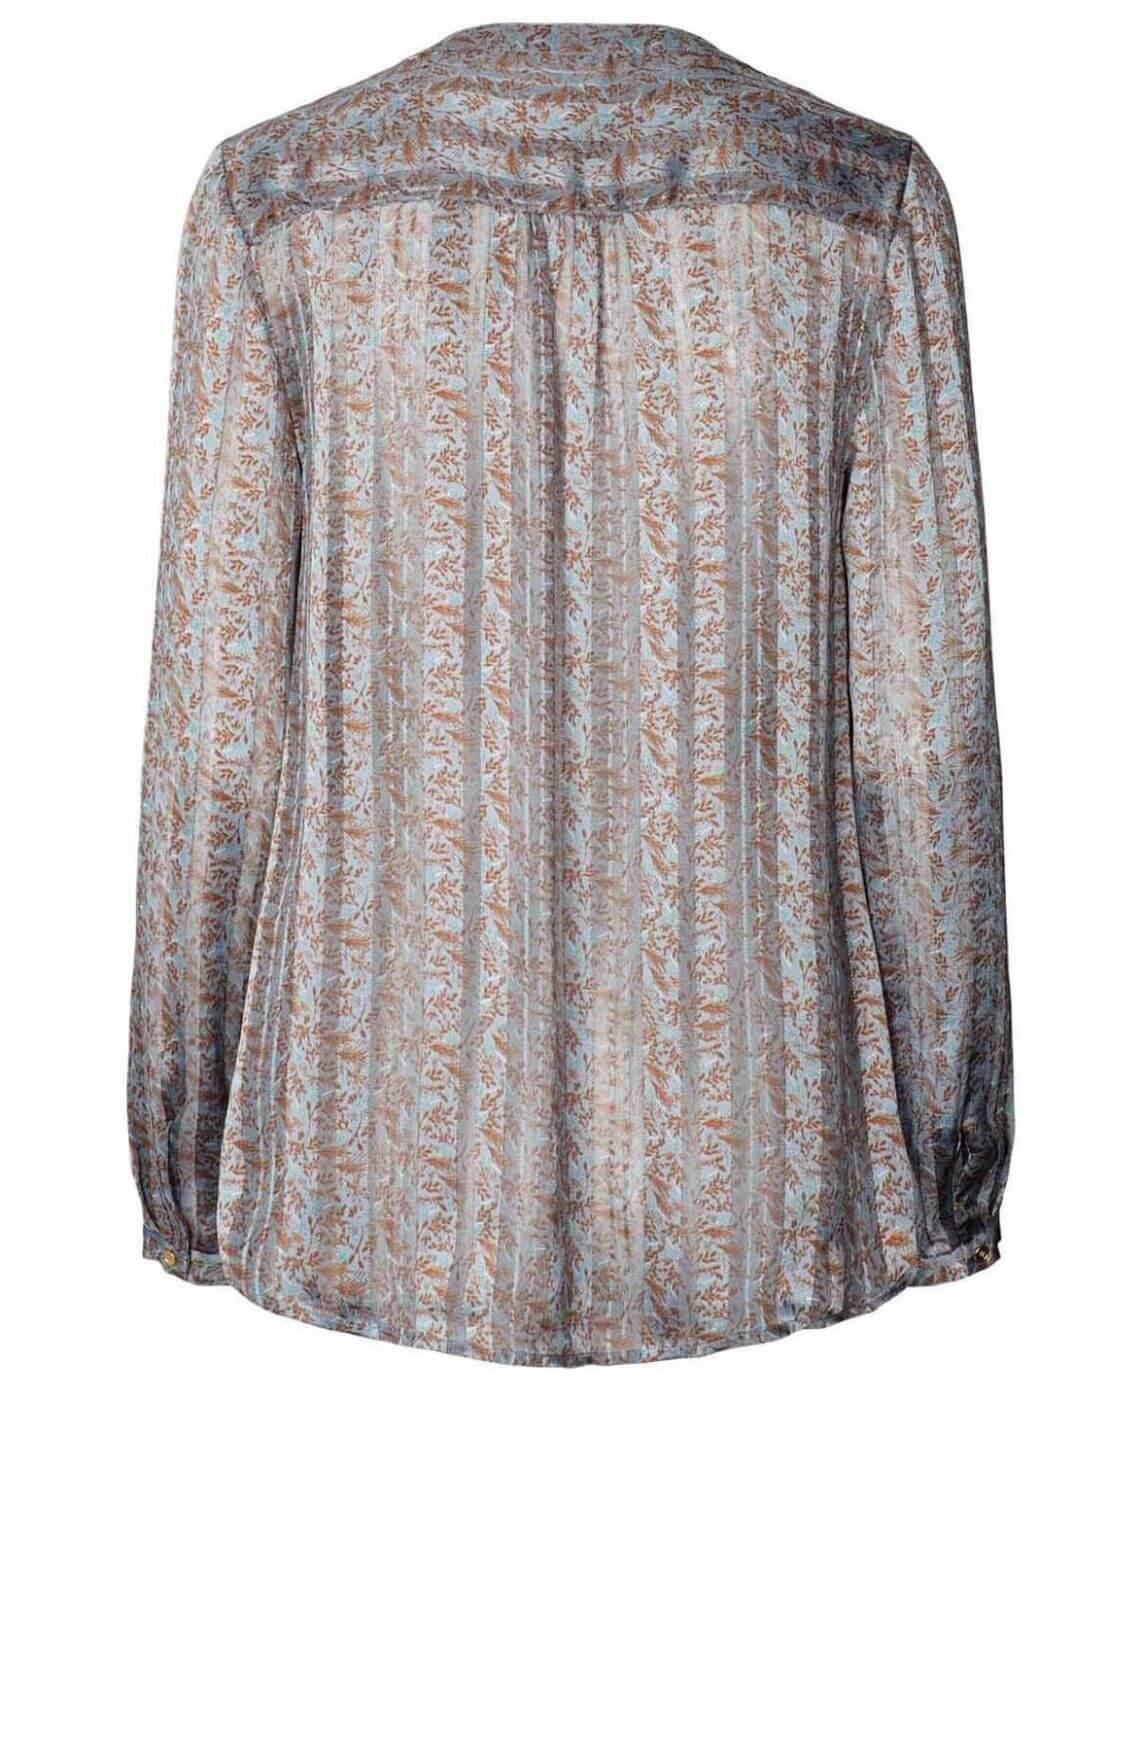 Lollys Laundry Dames Singh blouse Blauw